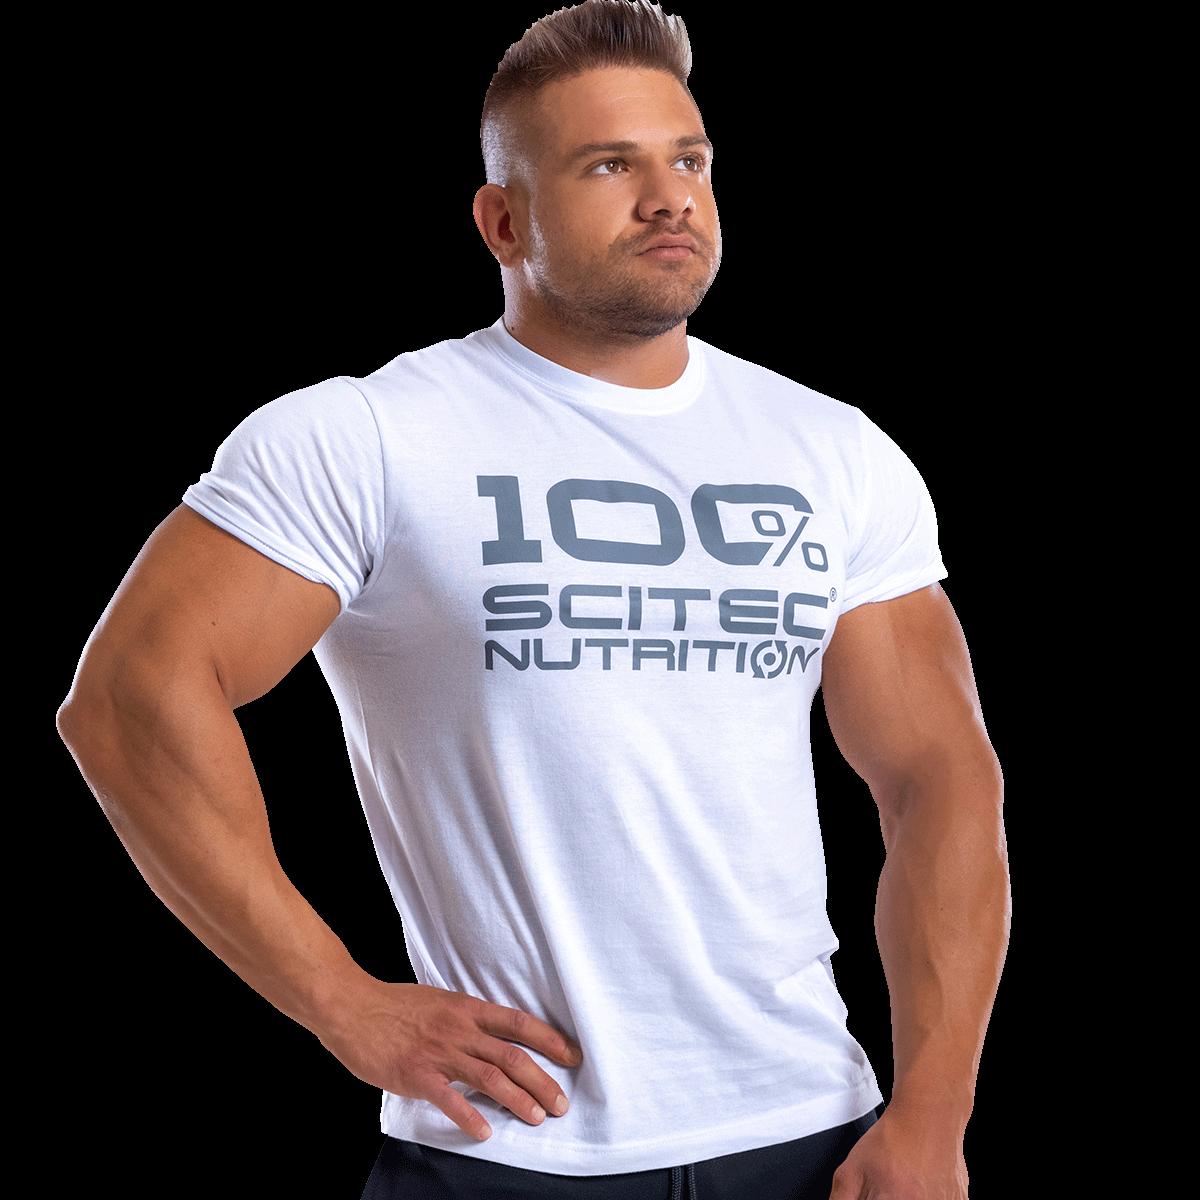 Scitec Nutrition 100% Scitec Nutrition férfi póló